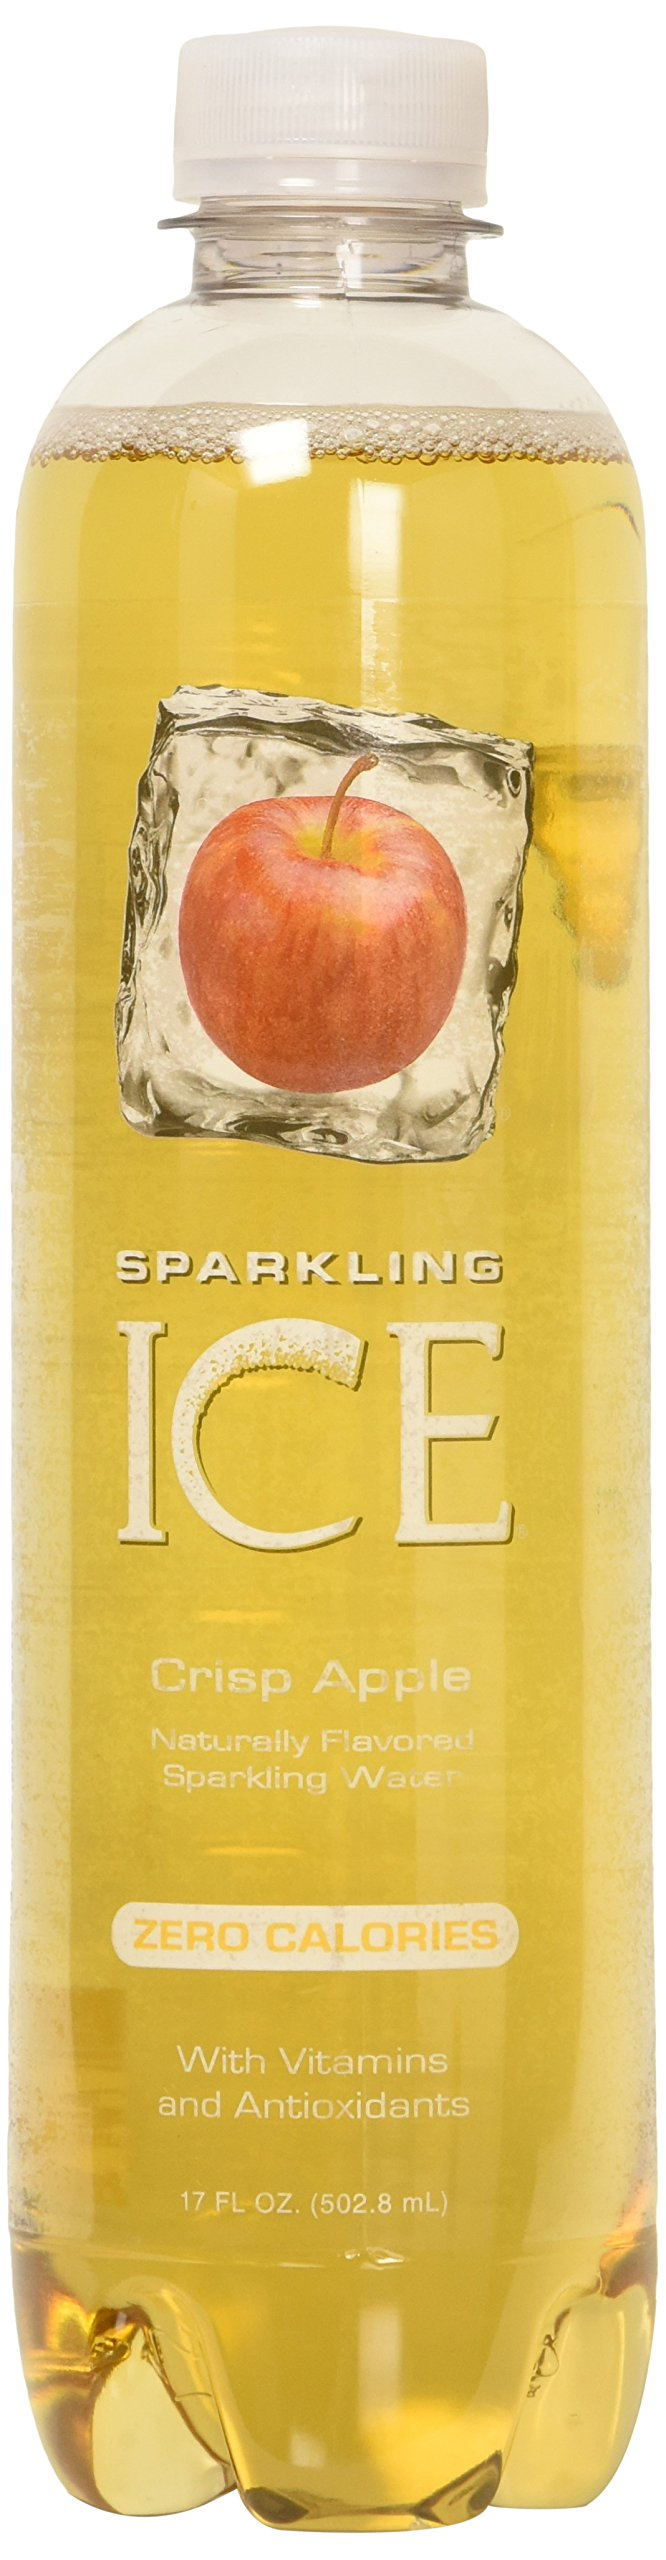 Sparkling Ice Crisp Apple, 17 Fl Oz Bottles (Pack of 12)